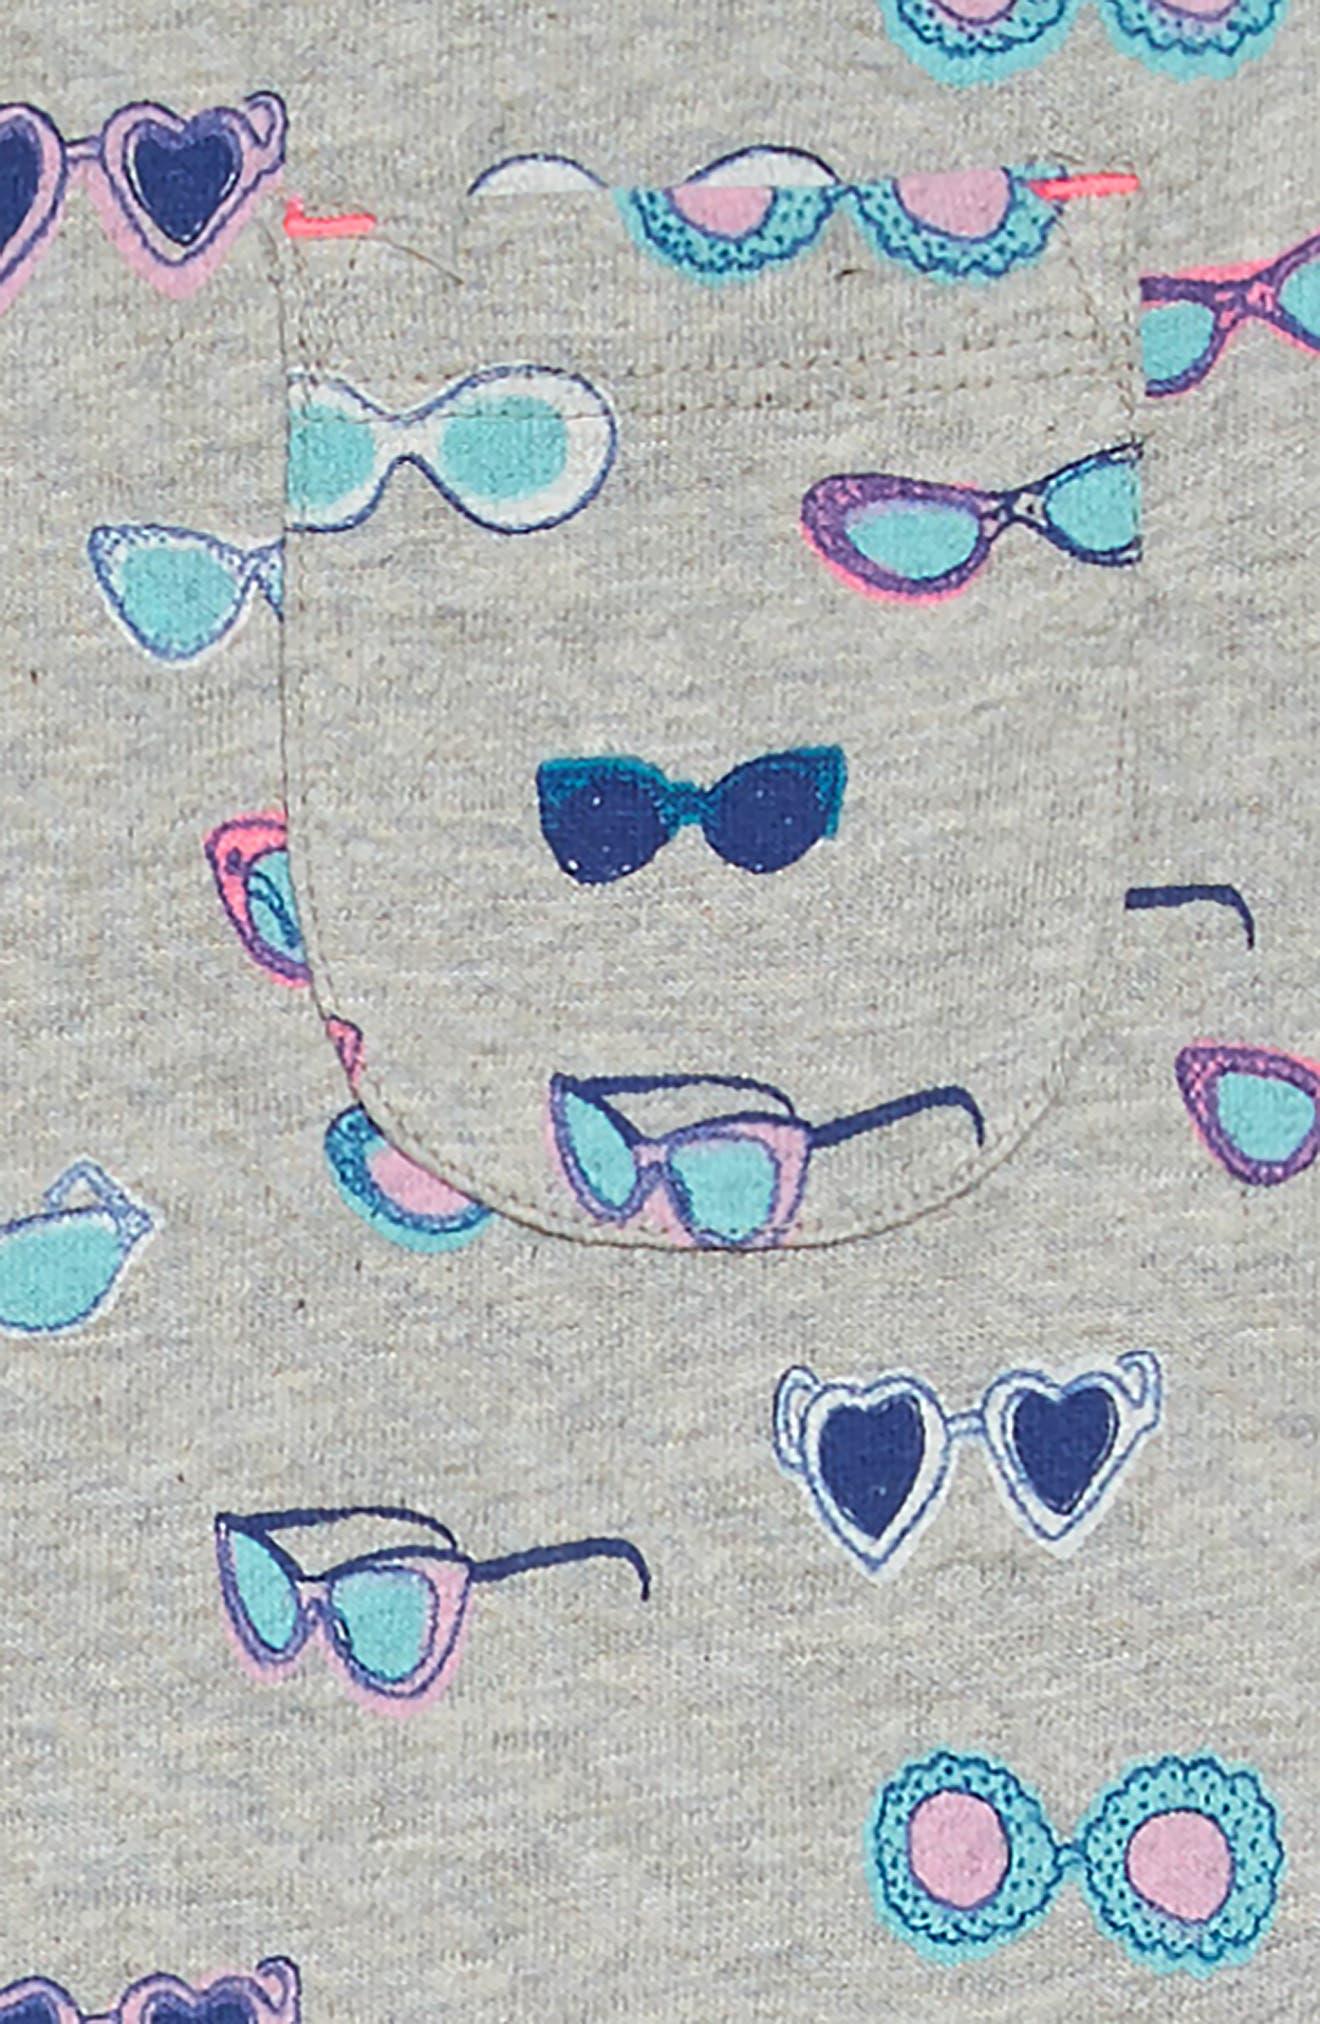 Drop-Waist Jersey Dress,                             Alternate thumbnail 3, color,                             062